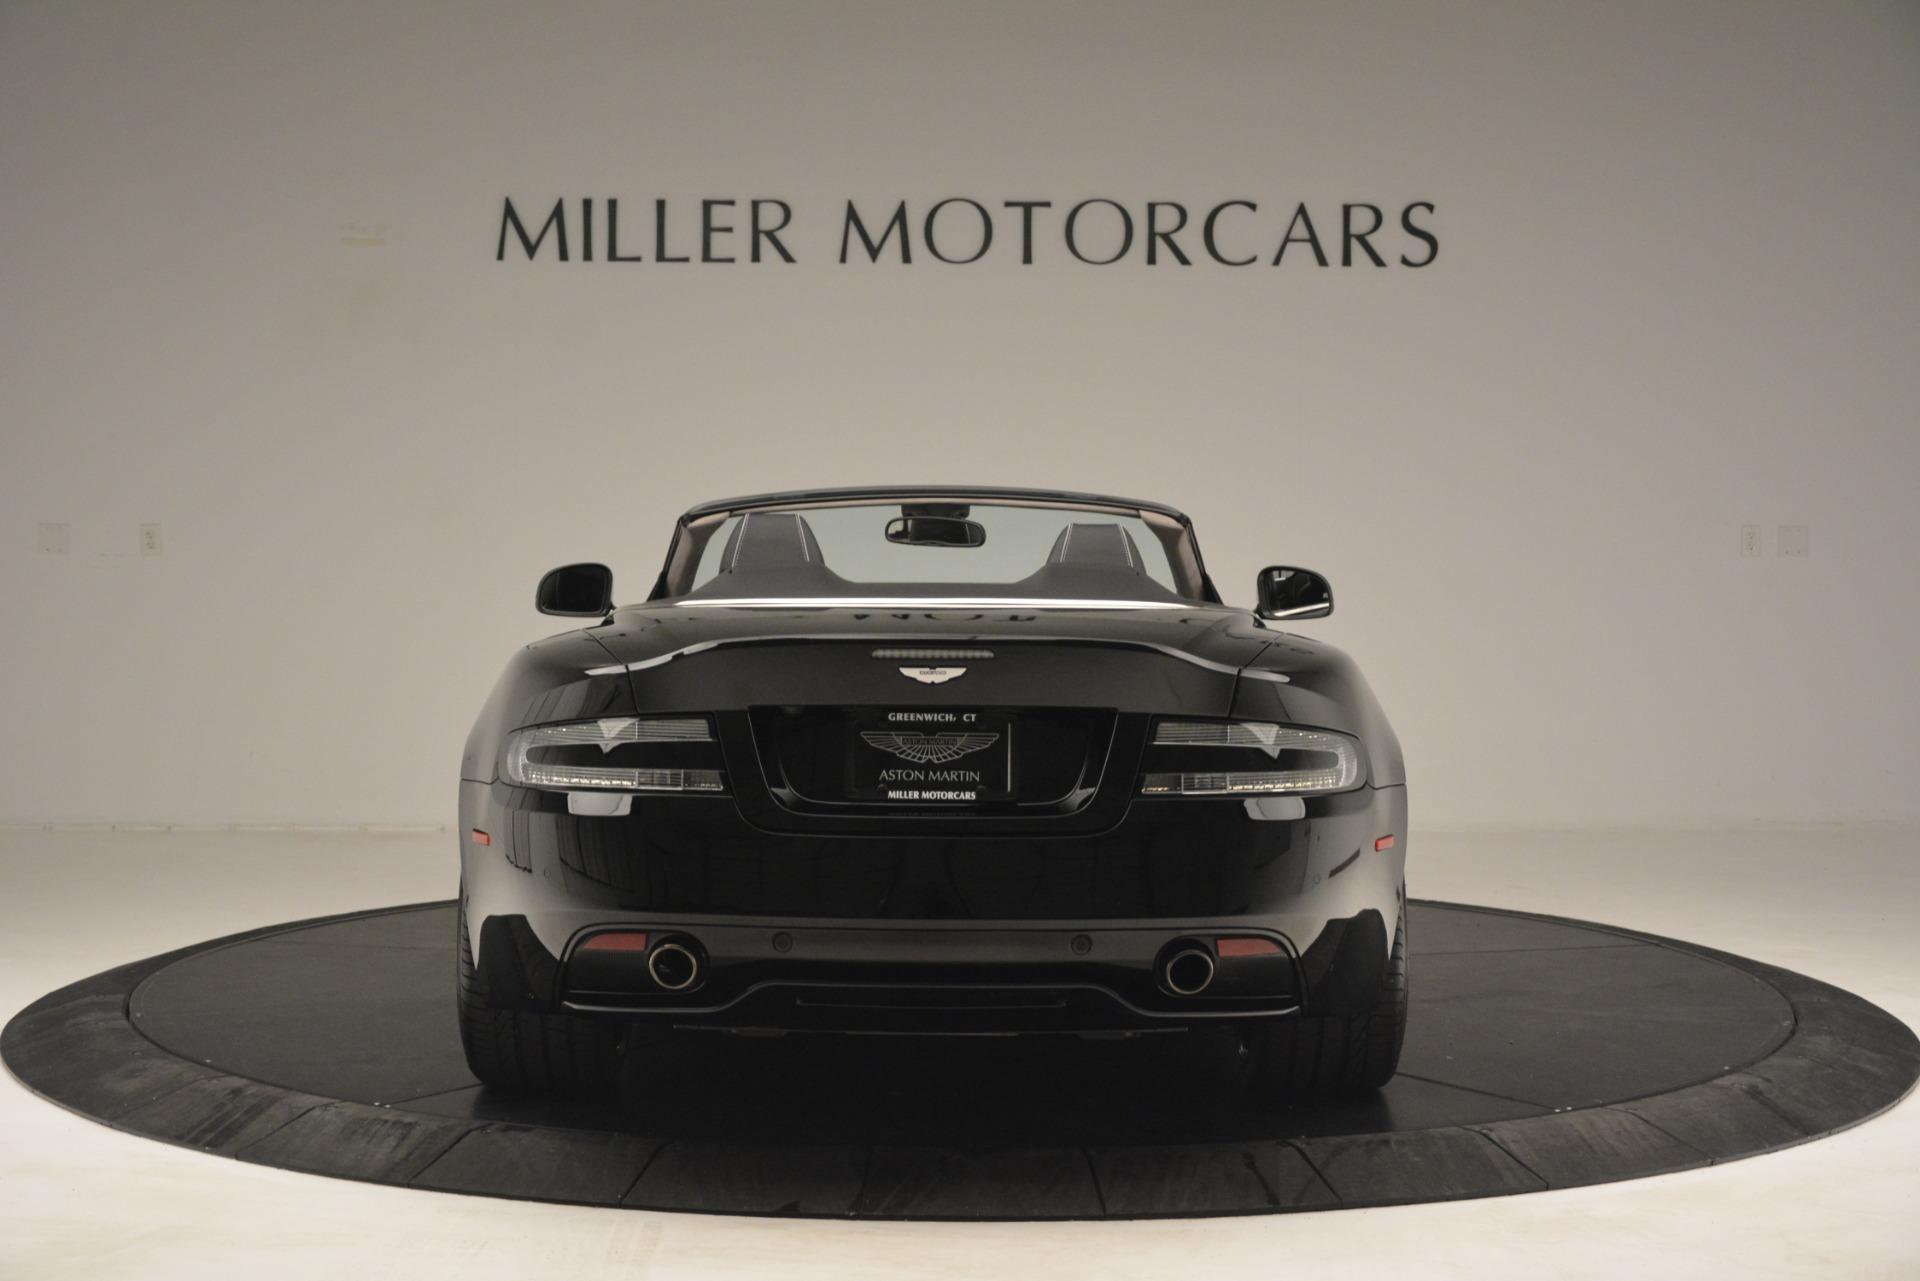 Used 2016 Aston Martin DB9 Convertible For Sale In Greenwich, CT. Alfa Romeo of Greenwich, 7495 2971_p6